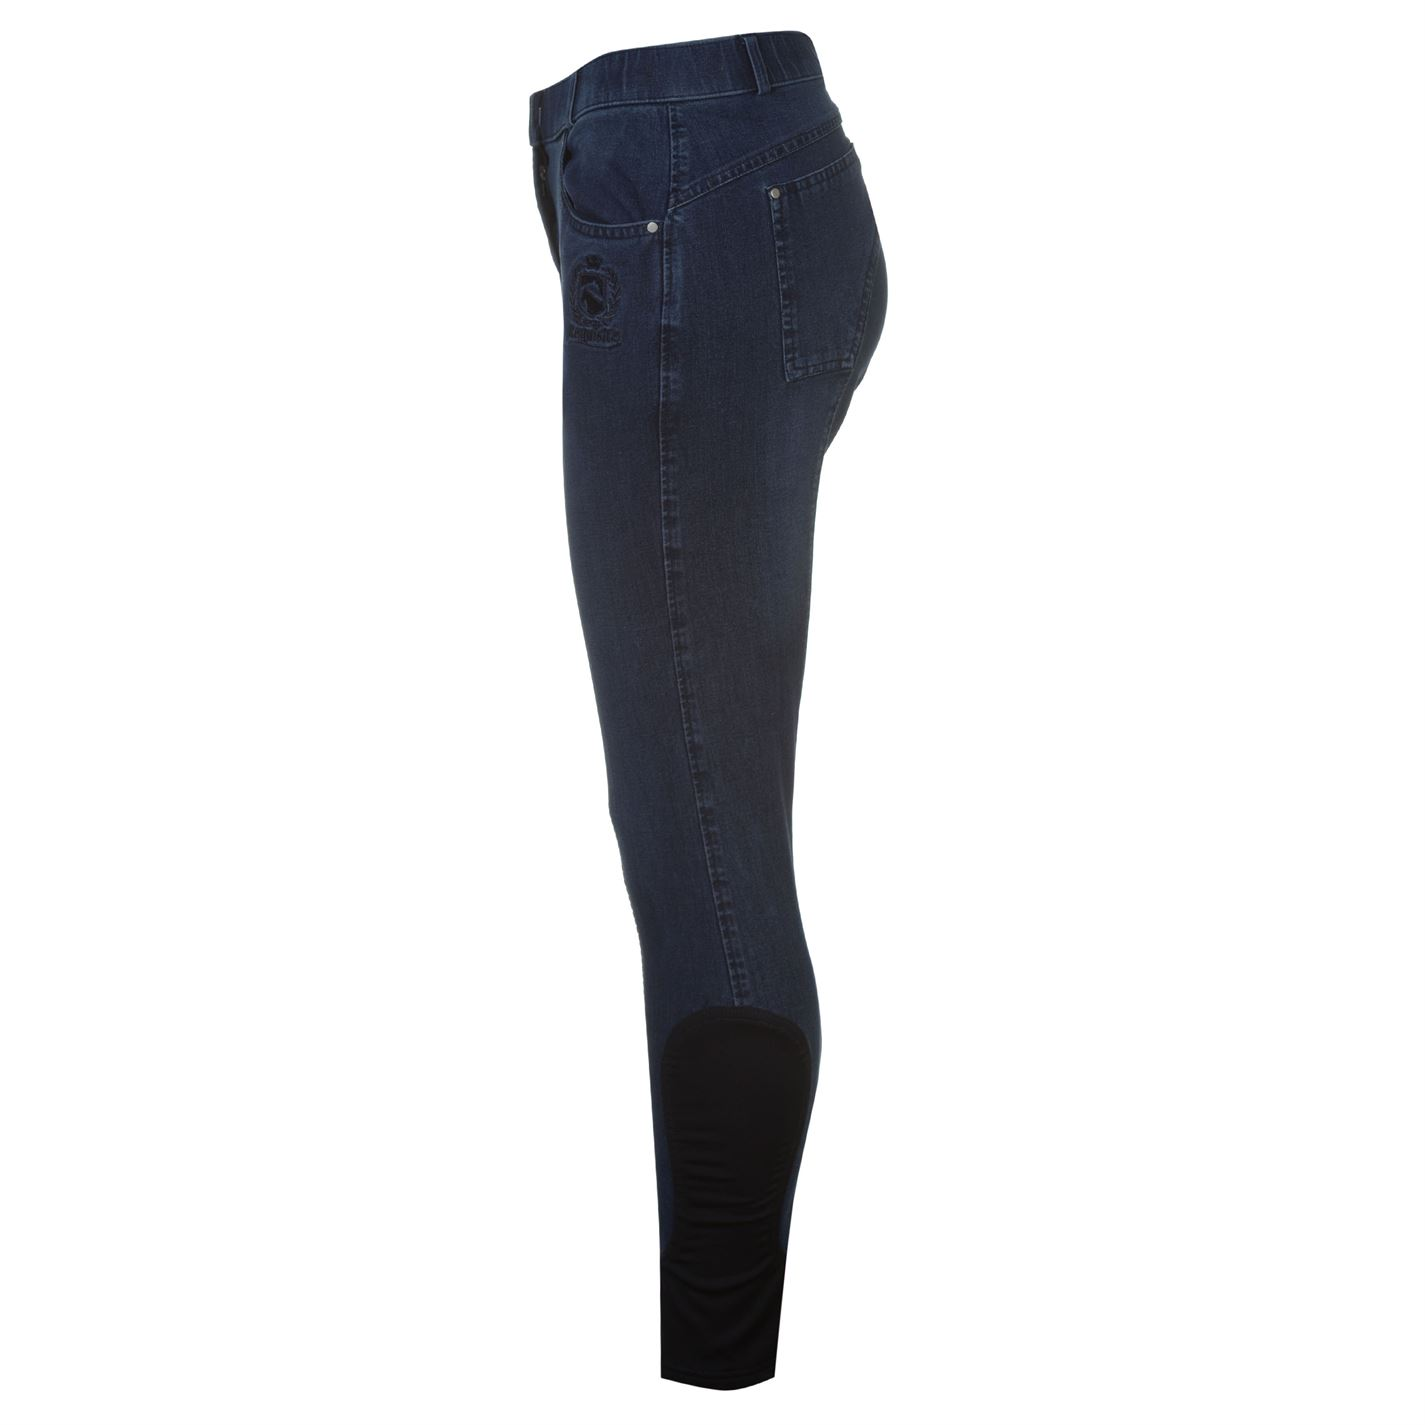 Requisite Stile Alla Donna Cavallerizza Pantaloni Jeans Jodhpurs VqGpUSzM